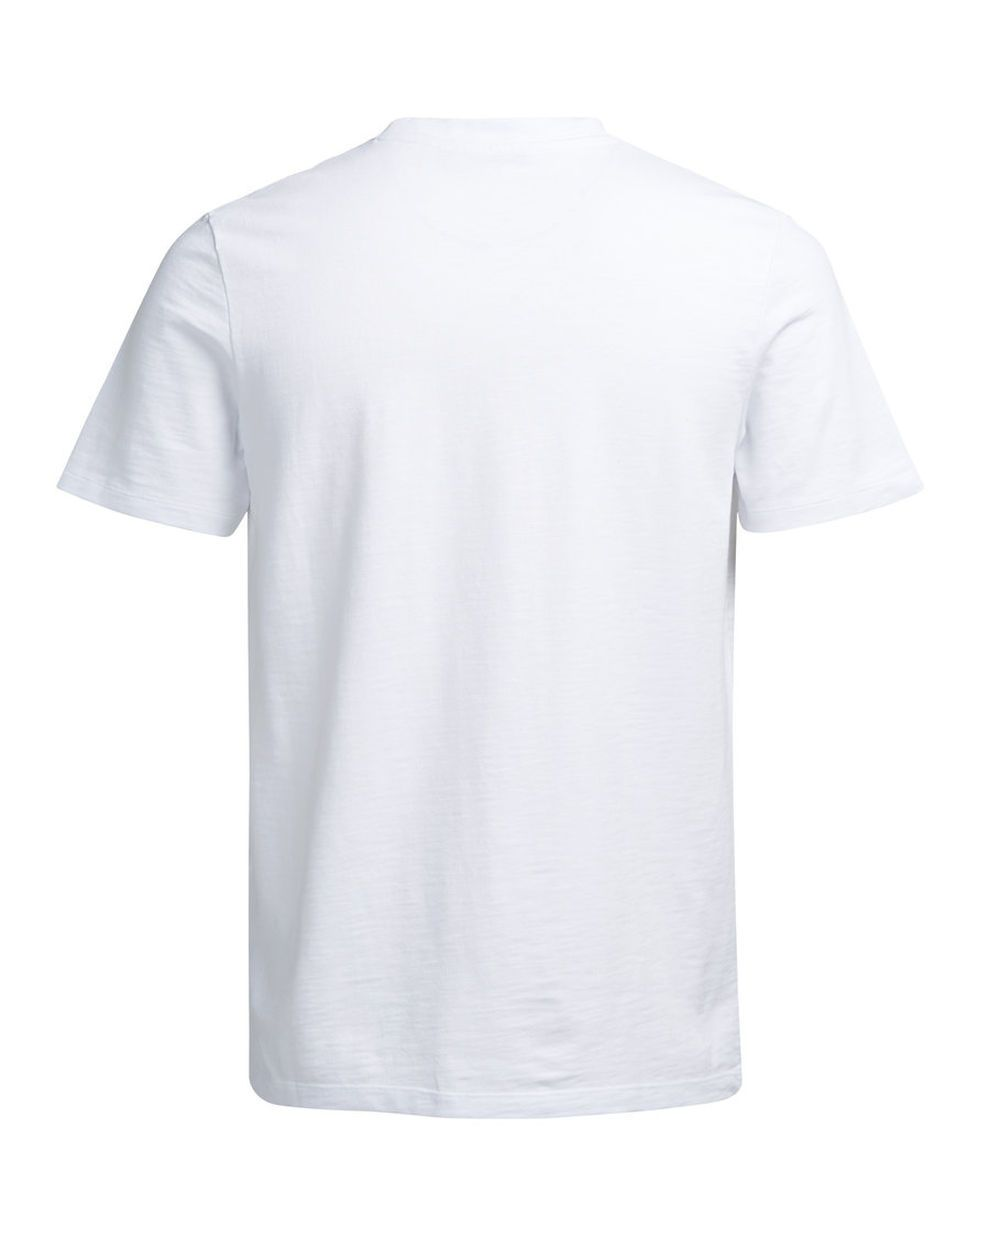 Template Kaos Polos Depan Belakang Coreldraw : template, polos, depan, belakang, coreldraw, Godslove, Dzanie, (gdzanie), Profile, Pinterest